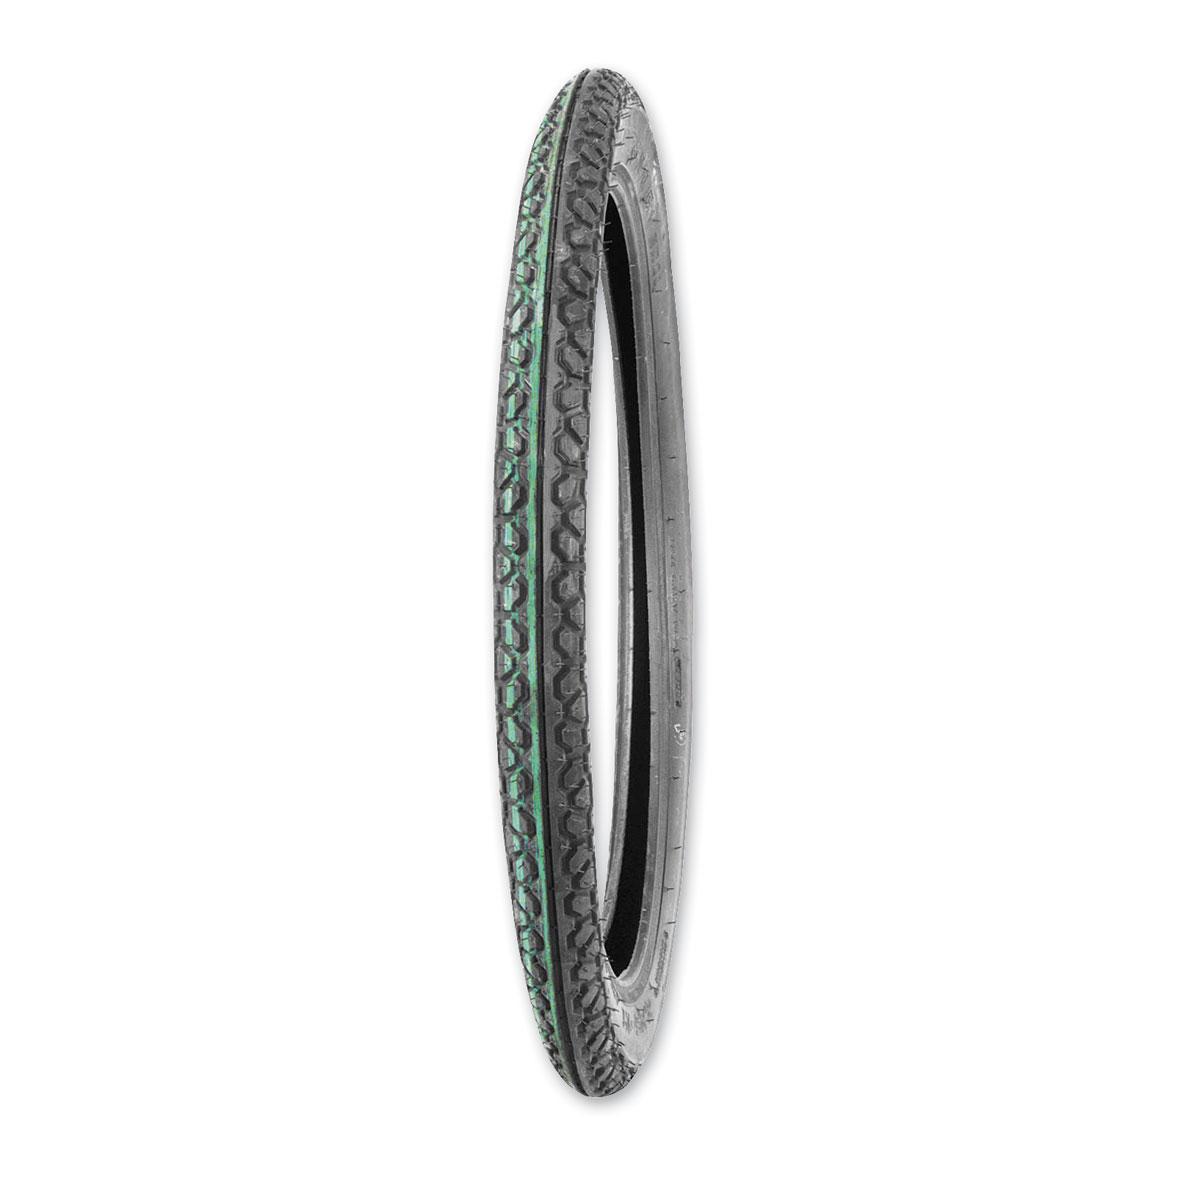 IRC NR21 3.00-18 Rear Tire